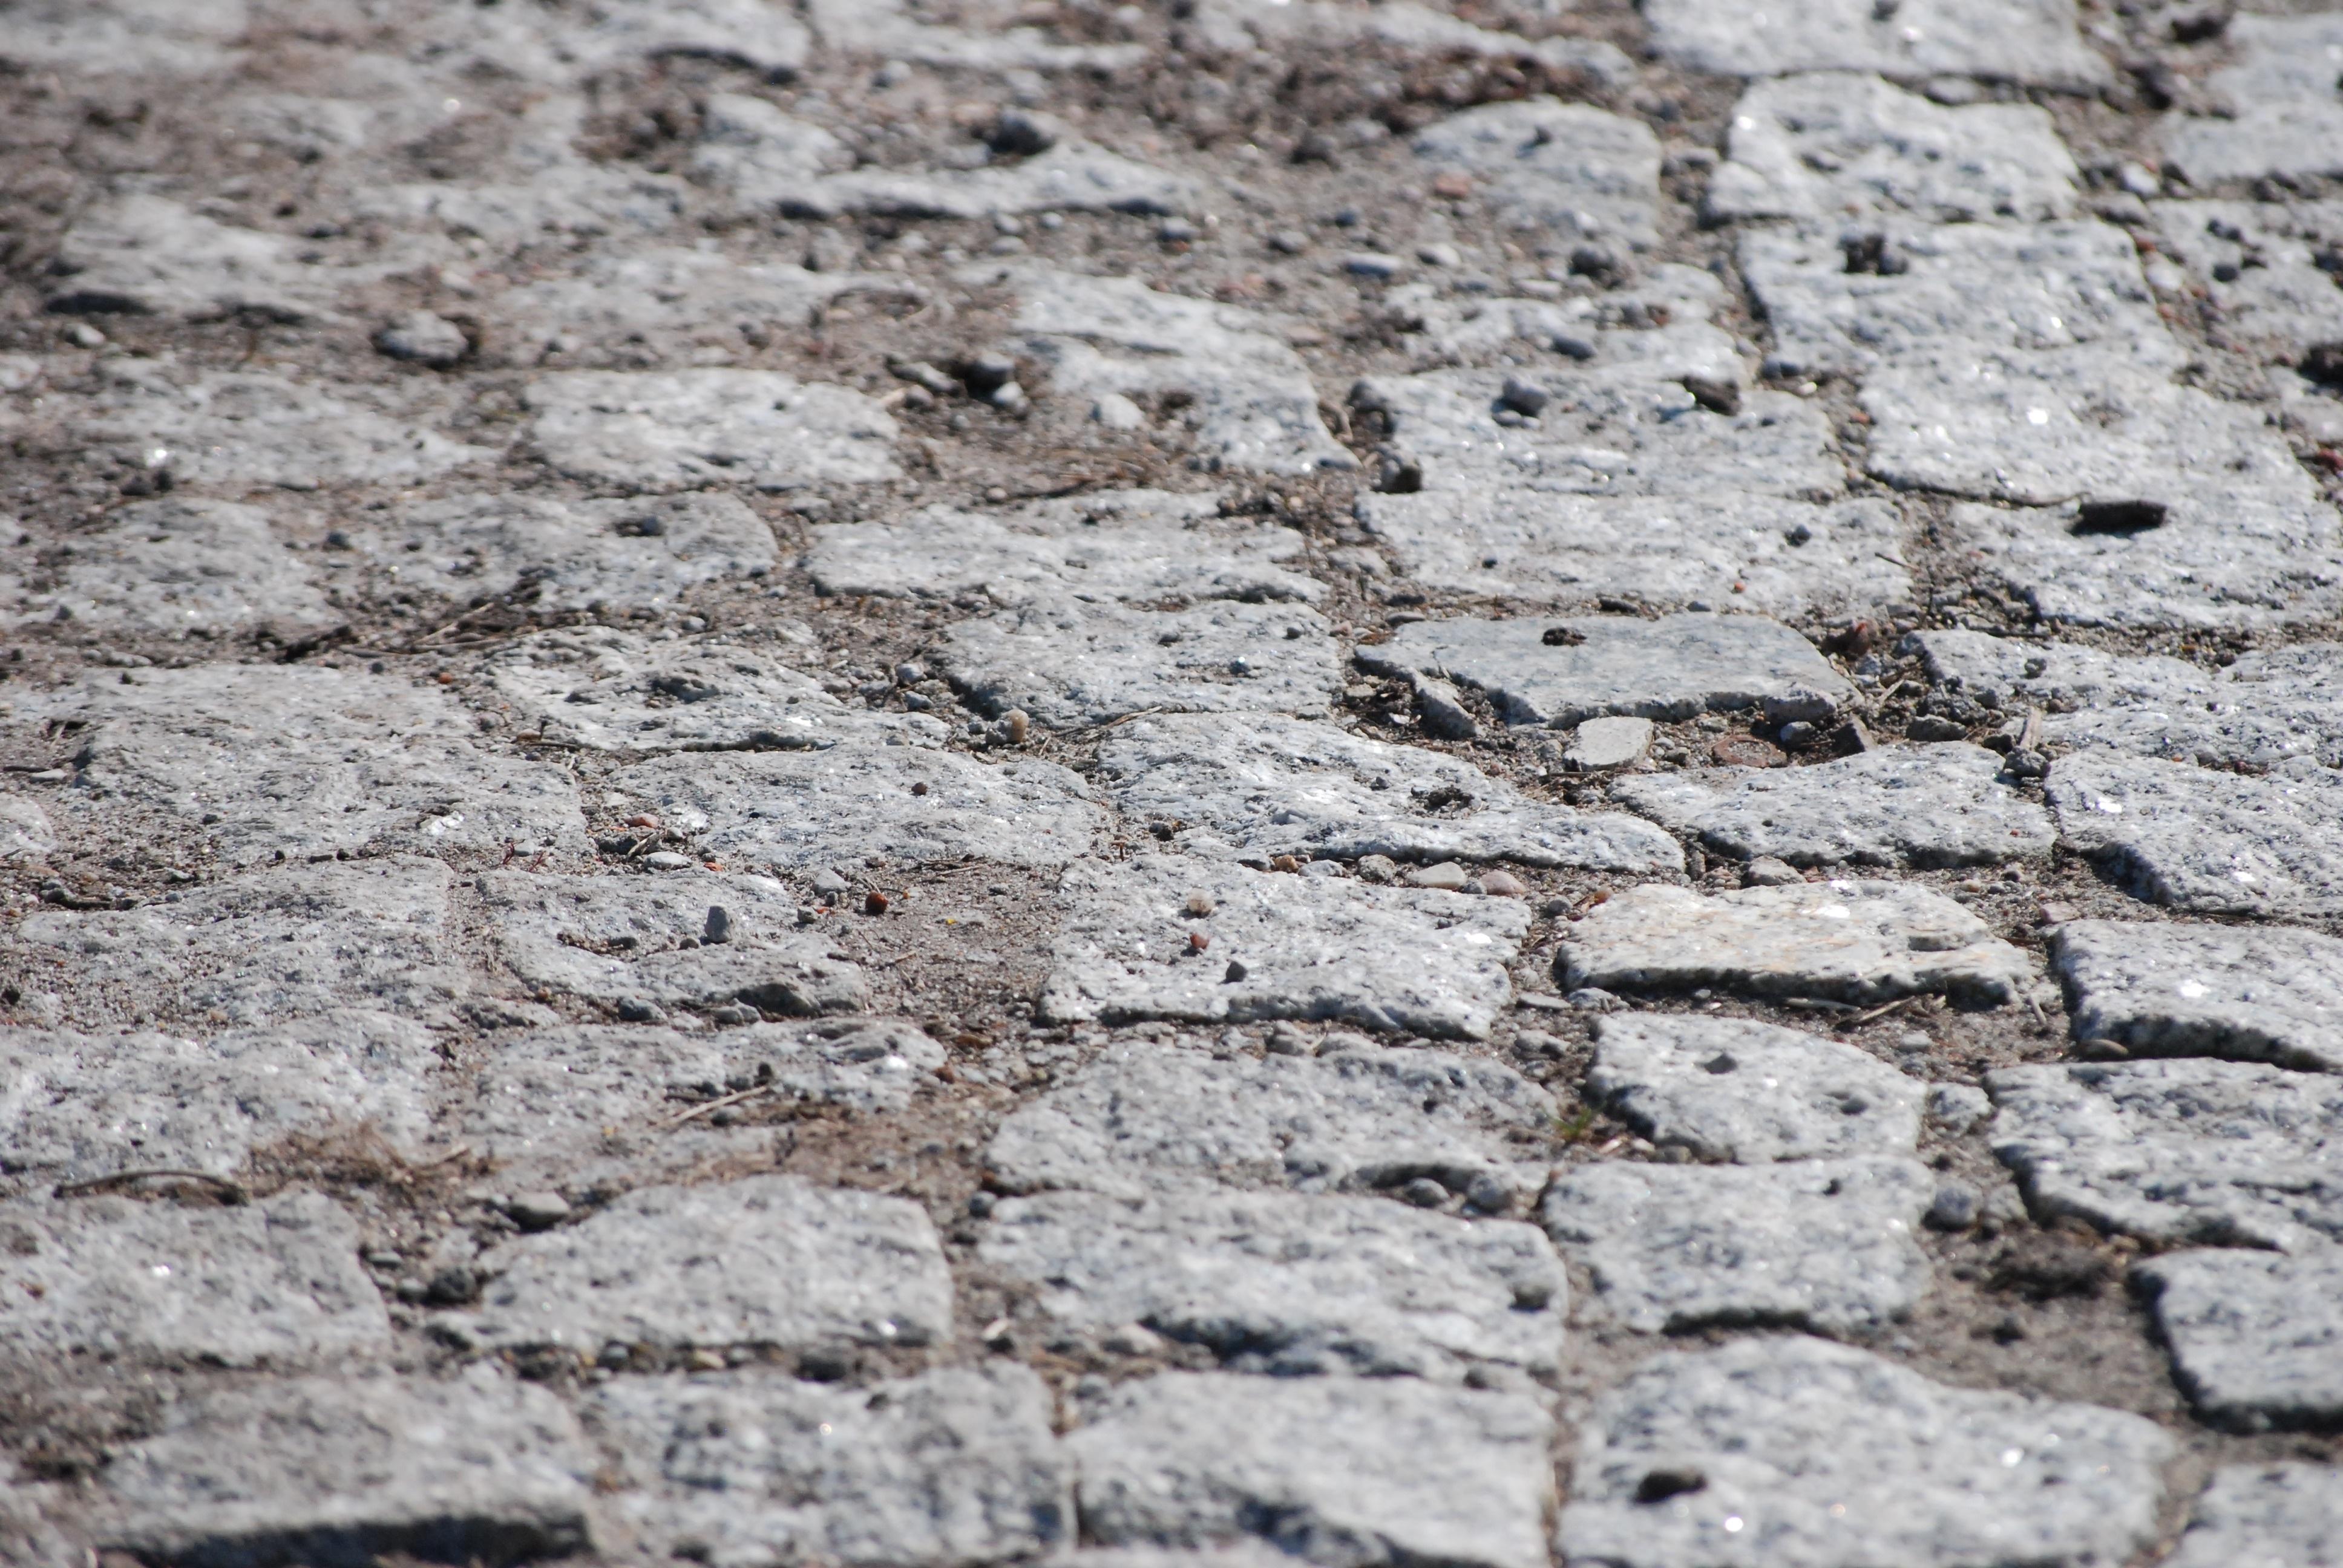 Rock Wood Texture Floor Cobblestone Wall Stone Asphalt Pavement Soil Stone  Wall Brick Material Cardboard Cube